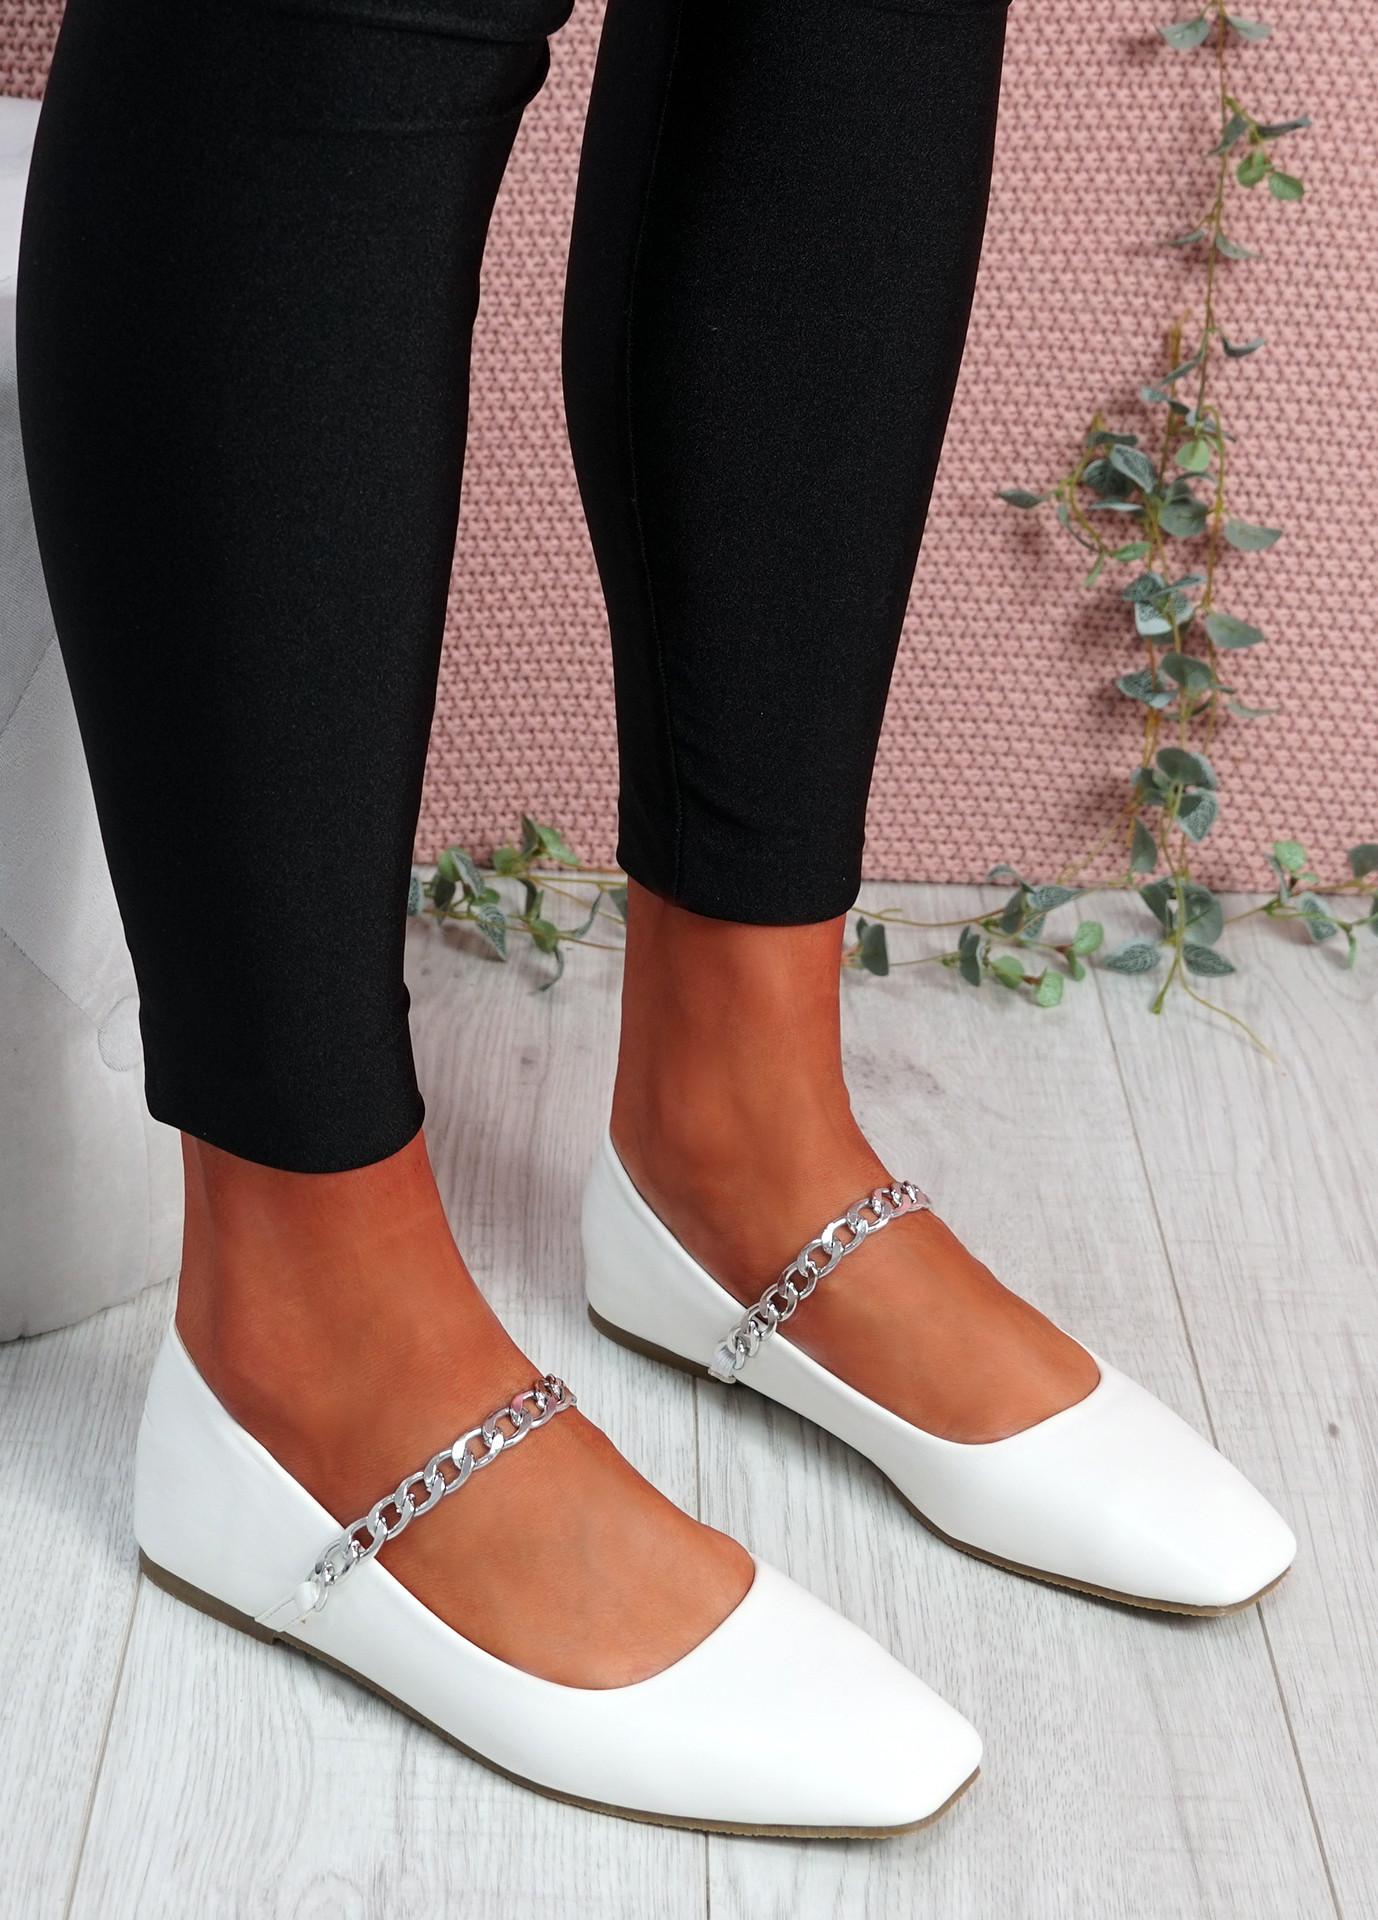 Binna Chain White Ballerinas